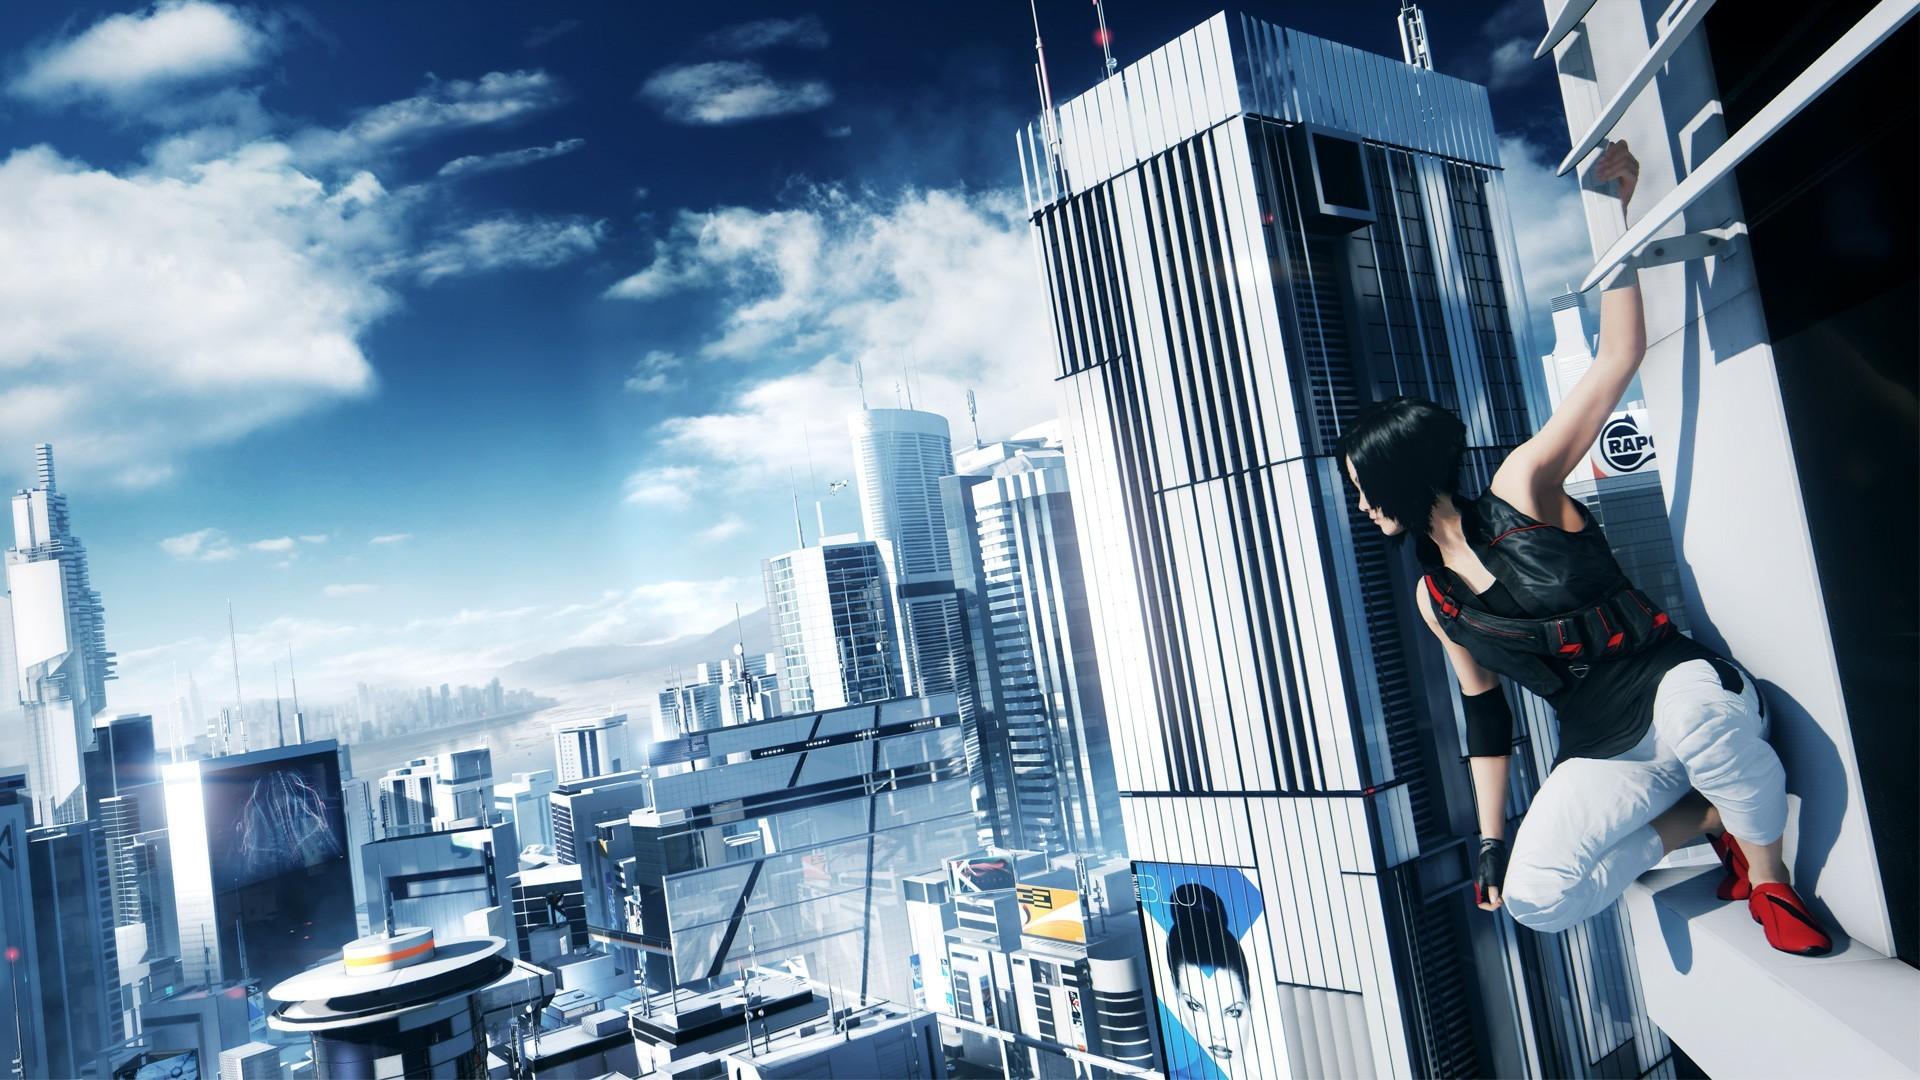 General 1920x1080 Mirror's Edge building cityscape video games